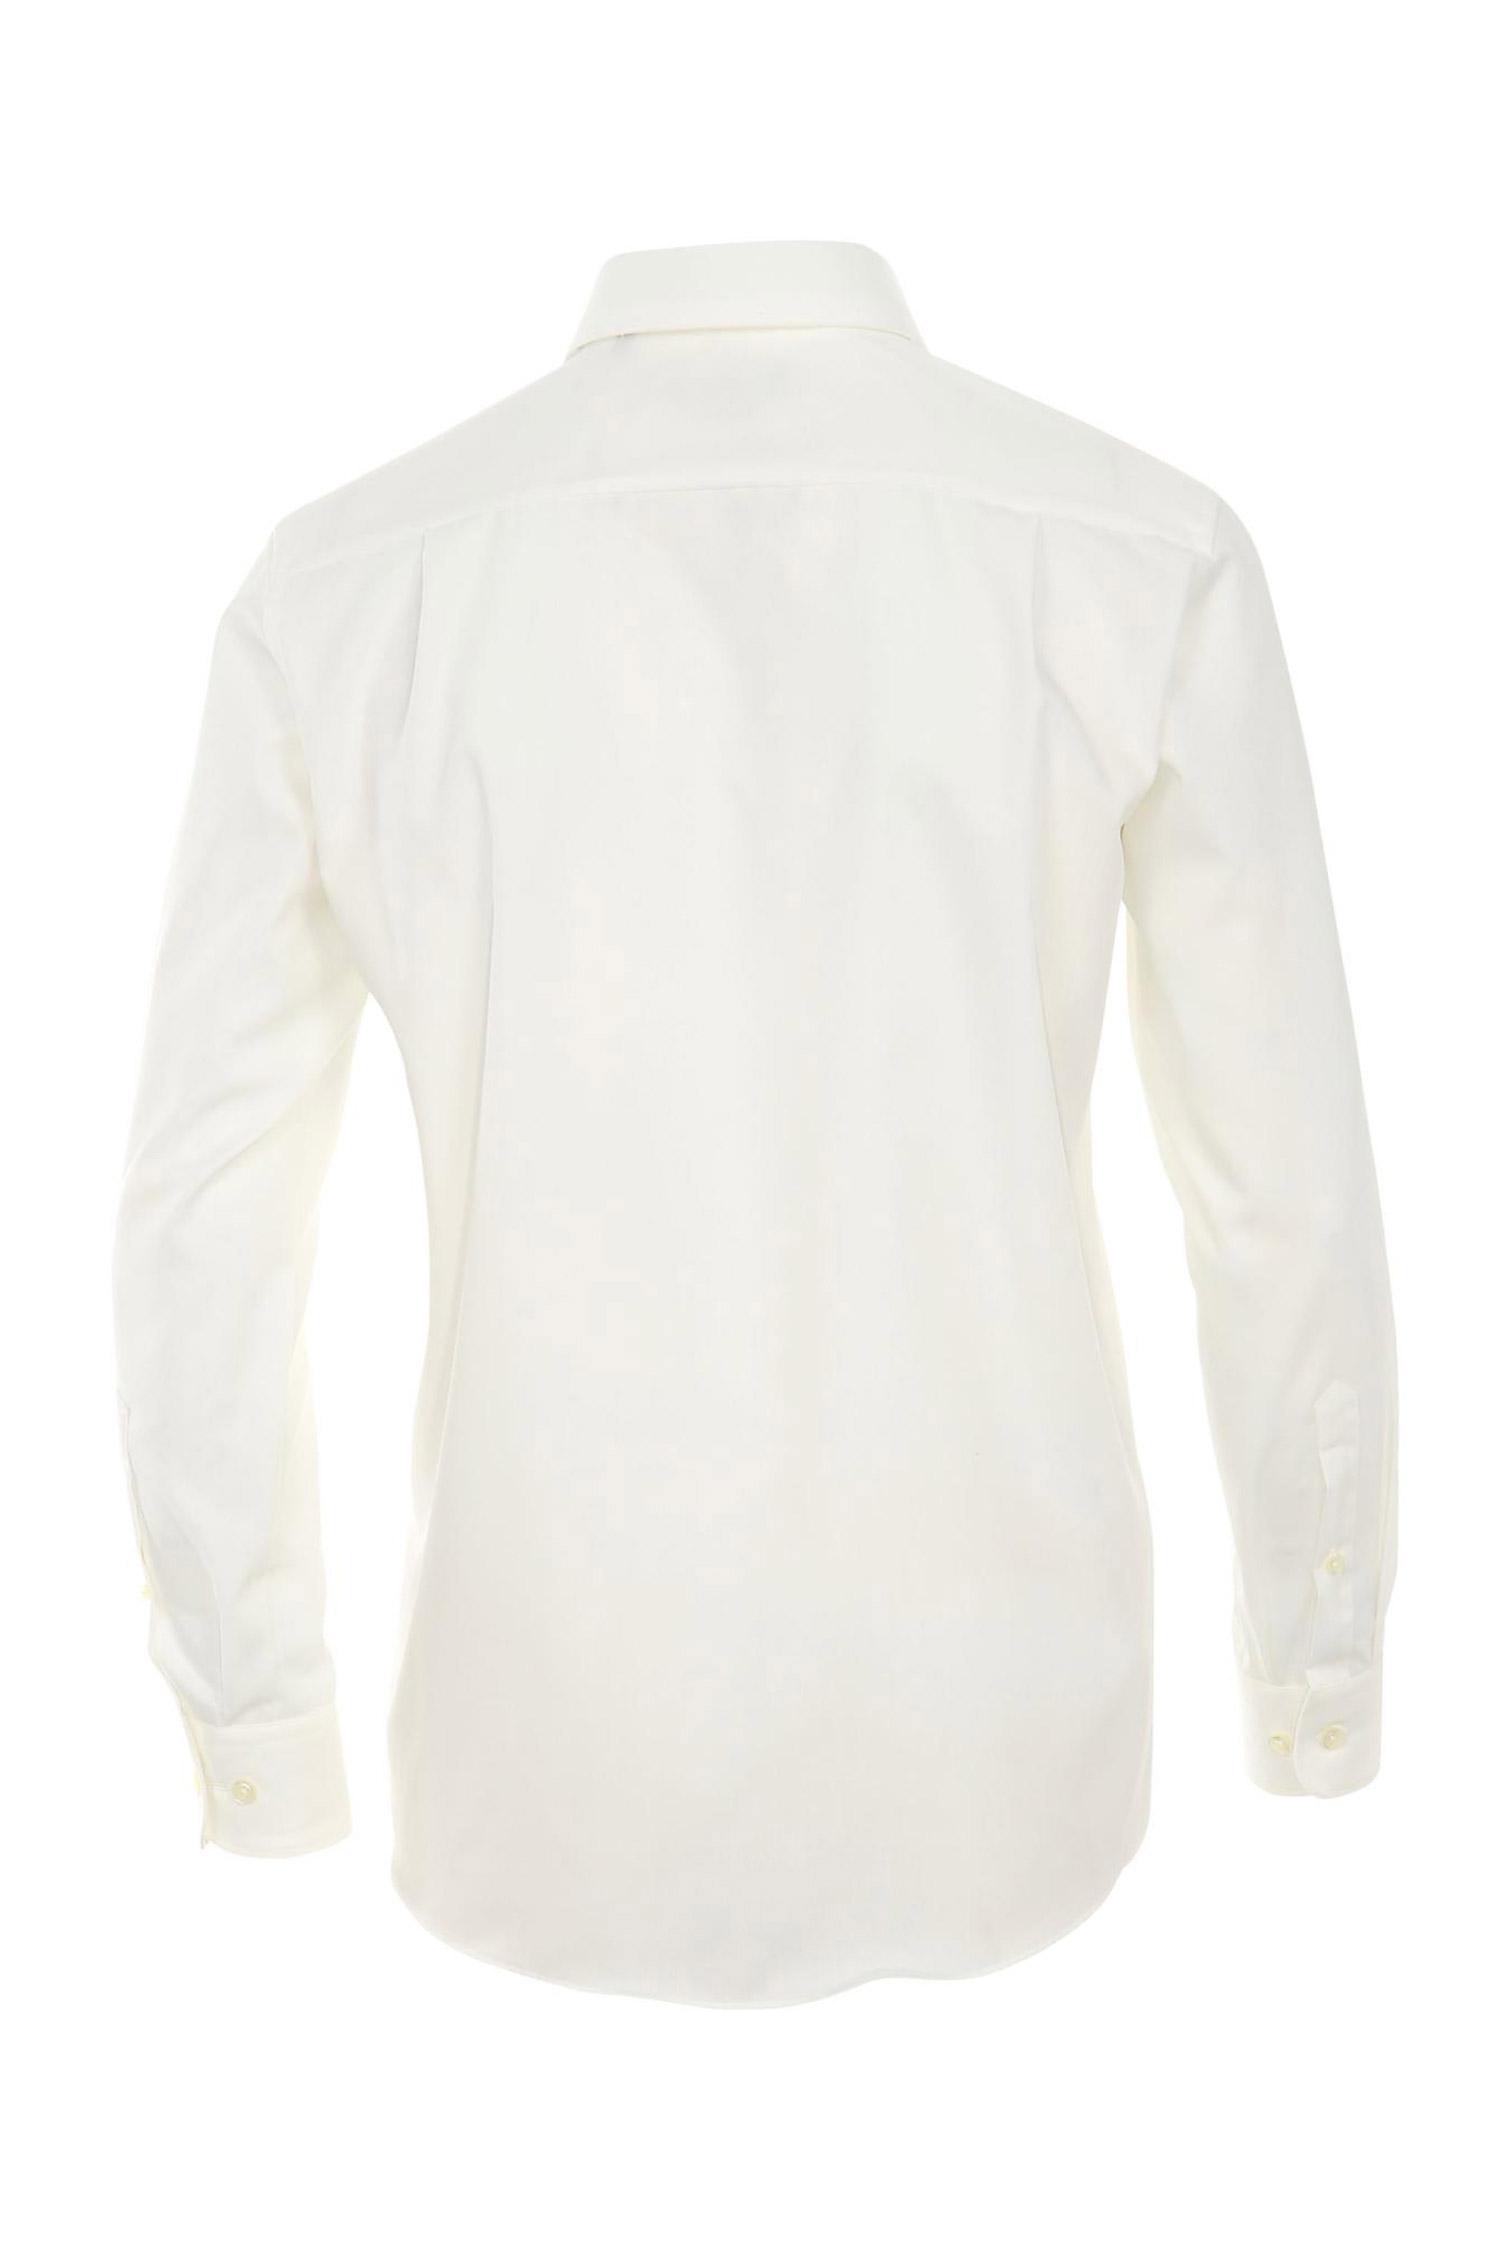 Camisas, Vestir Manga Larga, 106940, BLANCO | Zoom